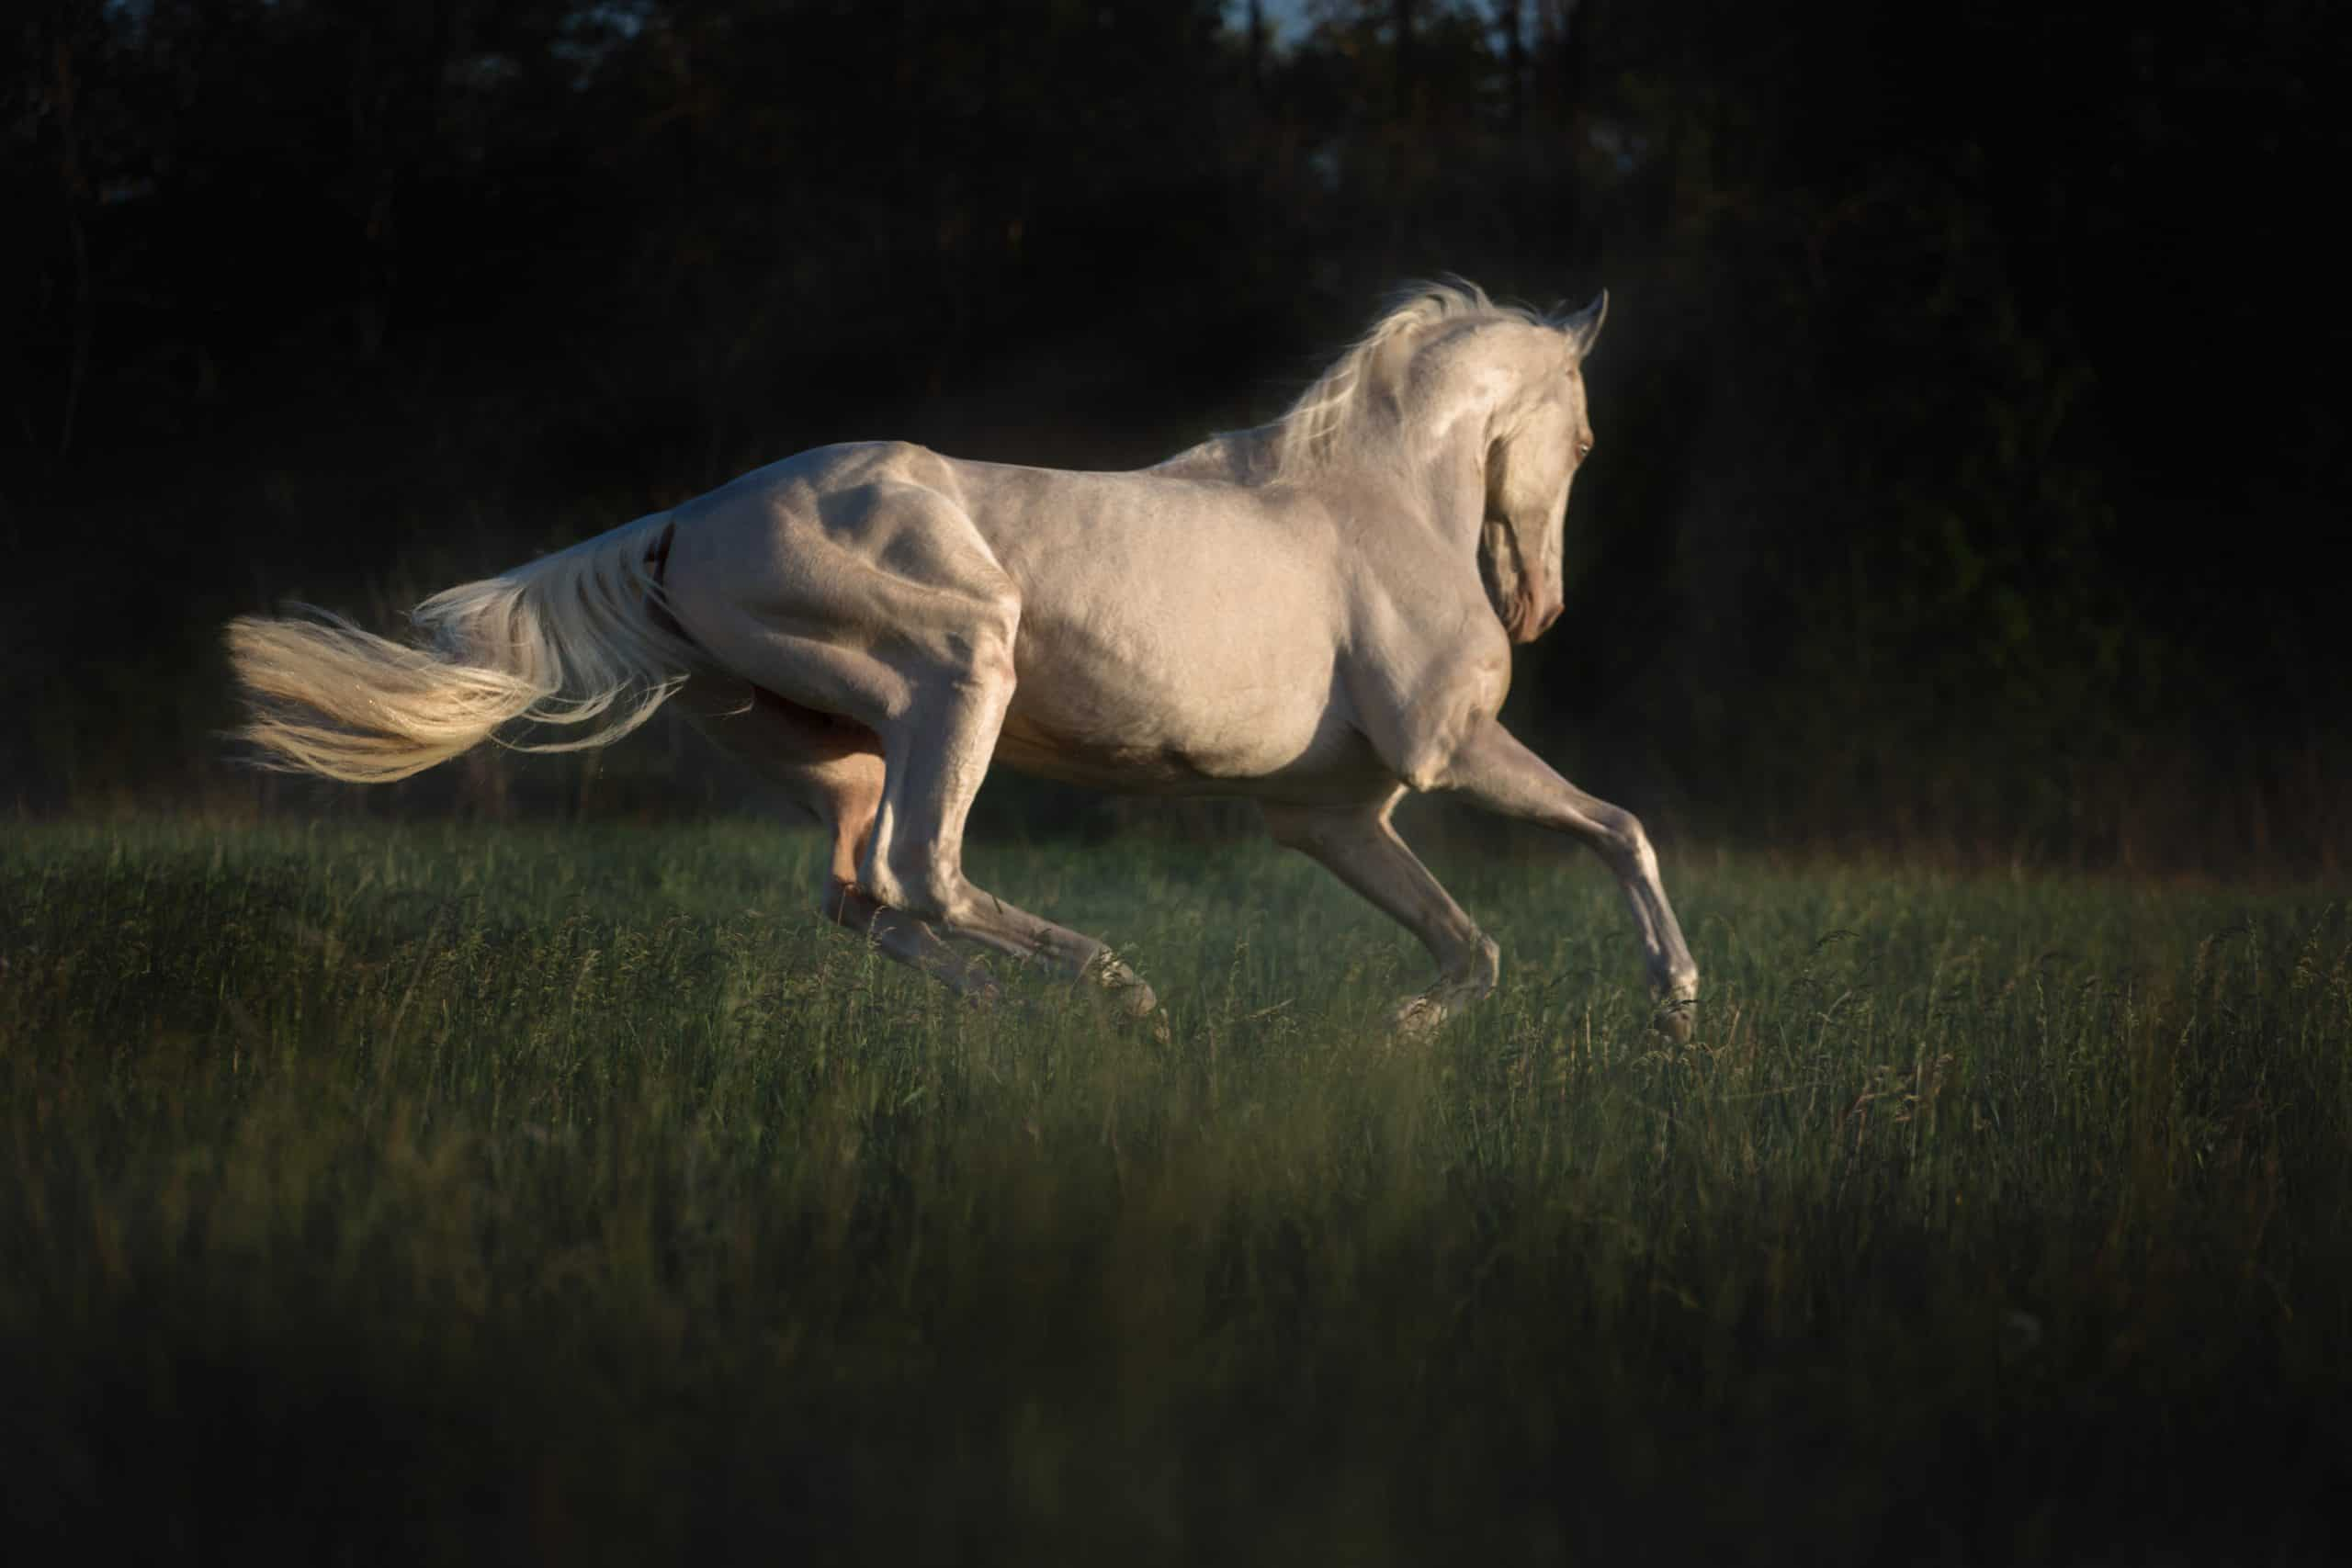 horse runs on the grass on dark forest background